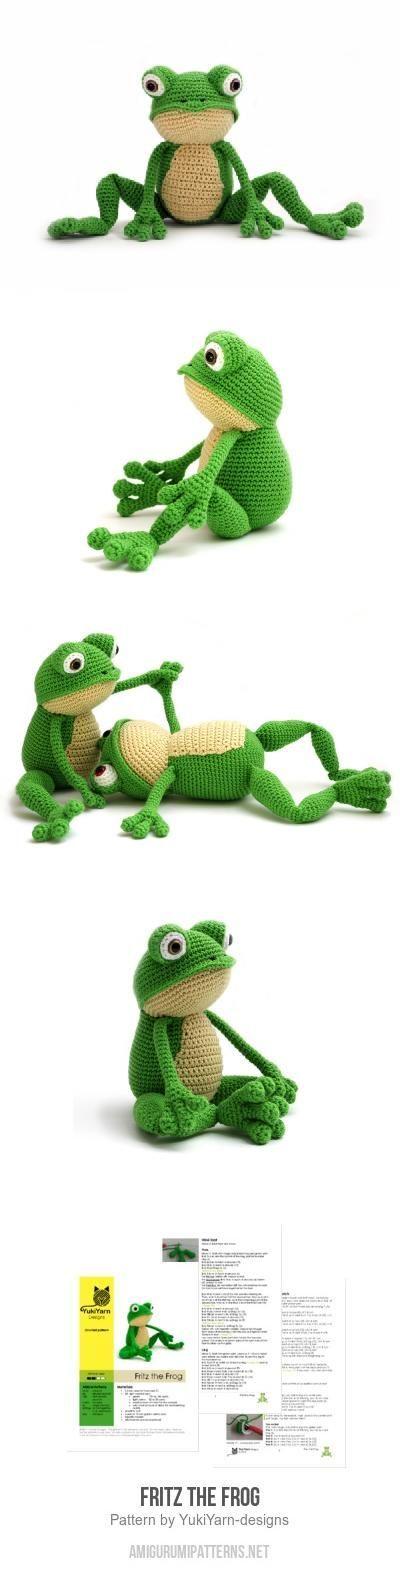 Fritz The Frog Amigurumi Pattern | ranas crochet | Pinterest ...